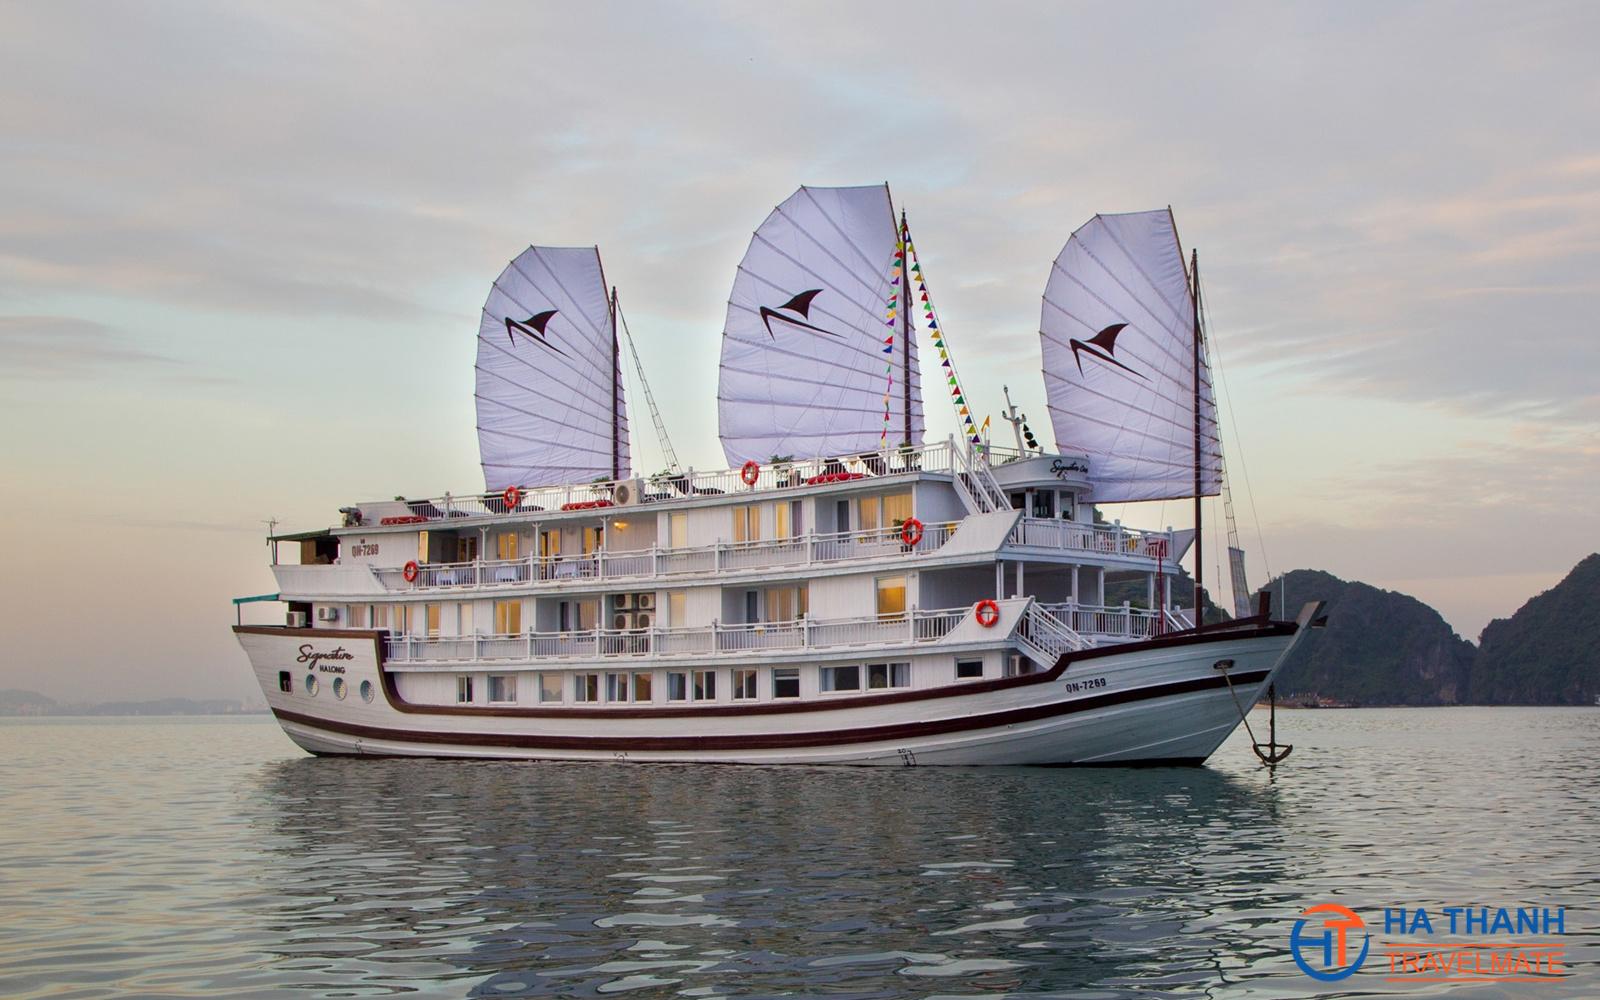 Signature Royal Cruise 2 days/1 night